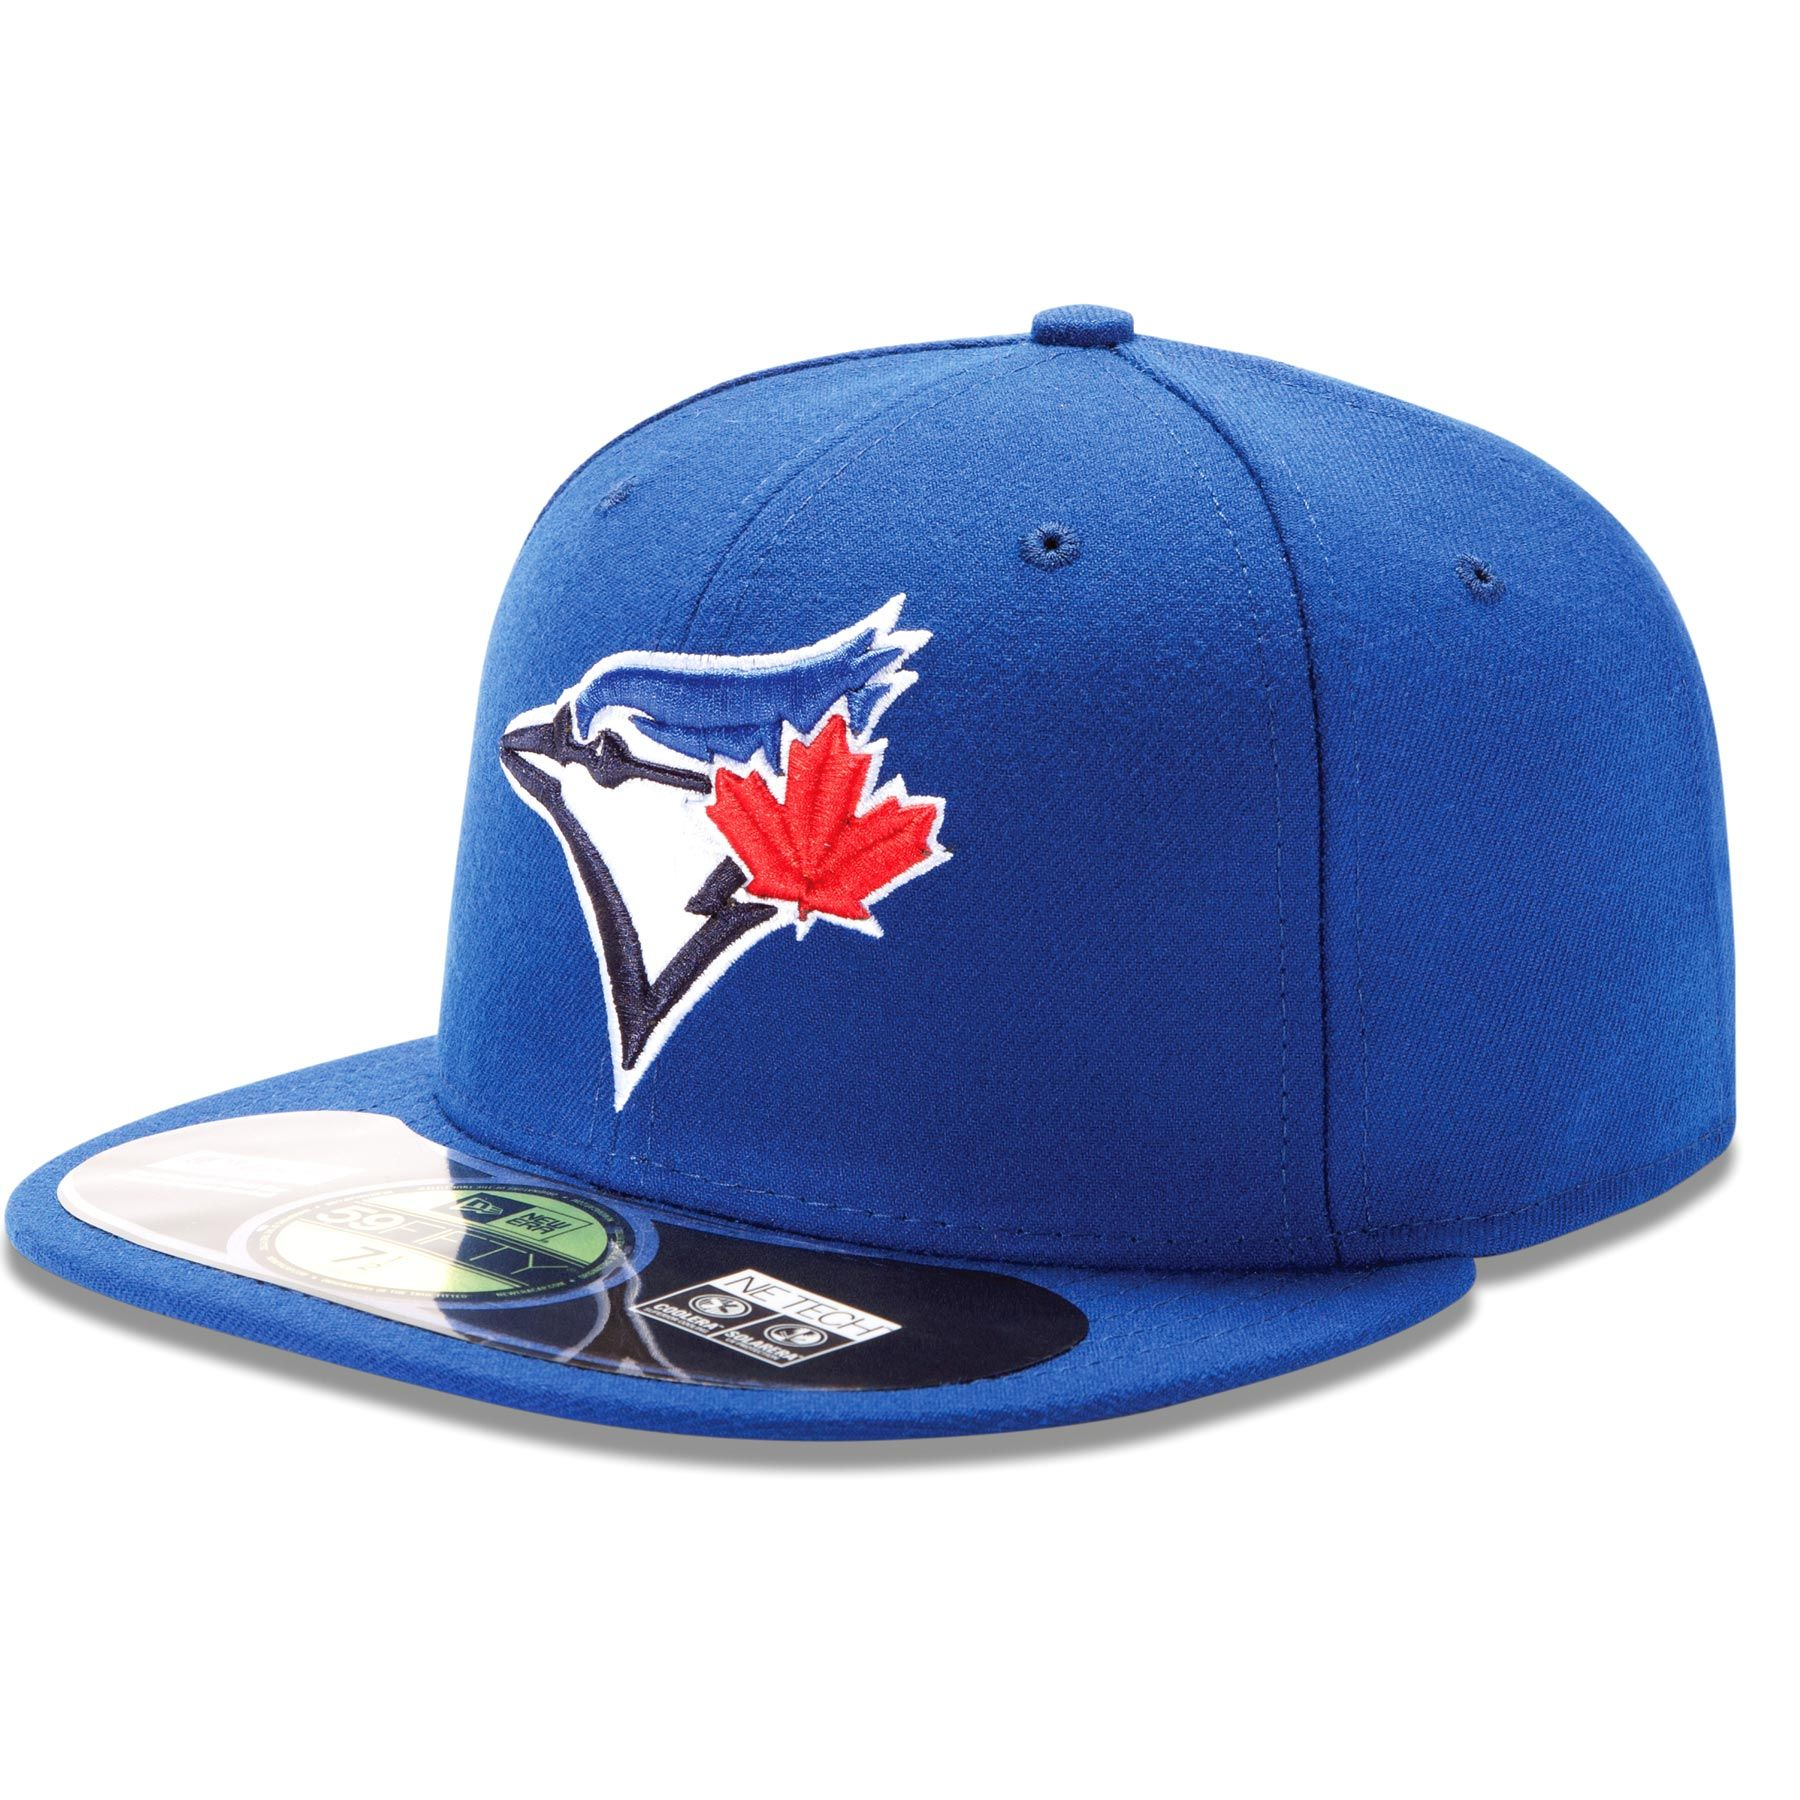 new concept 2eaf8 122a0 Toronto Blue Jays Baseball Hat